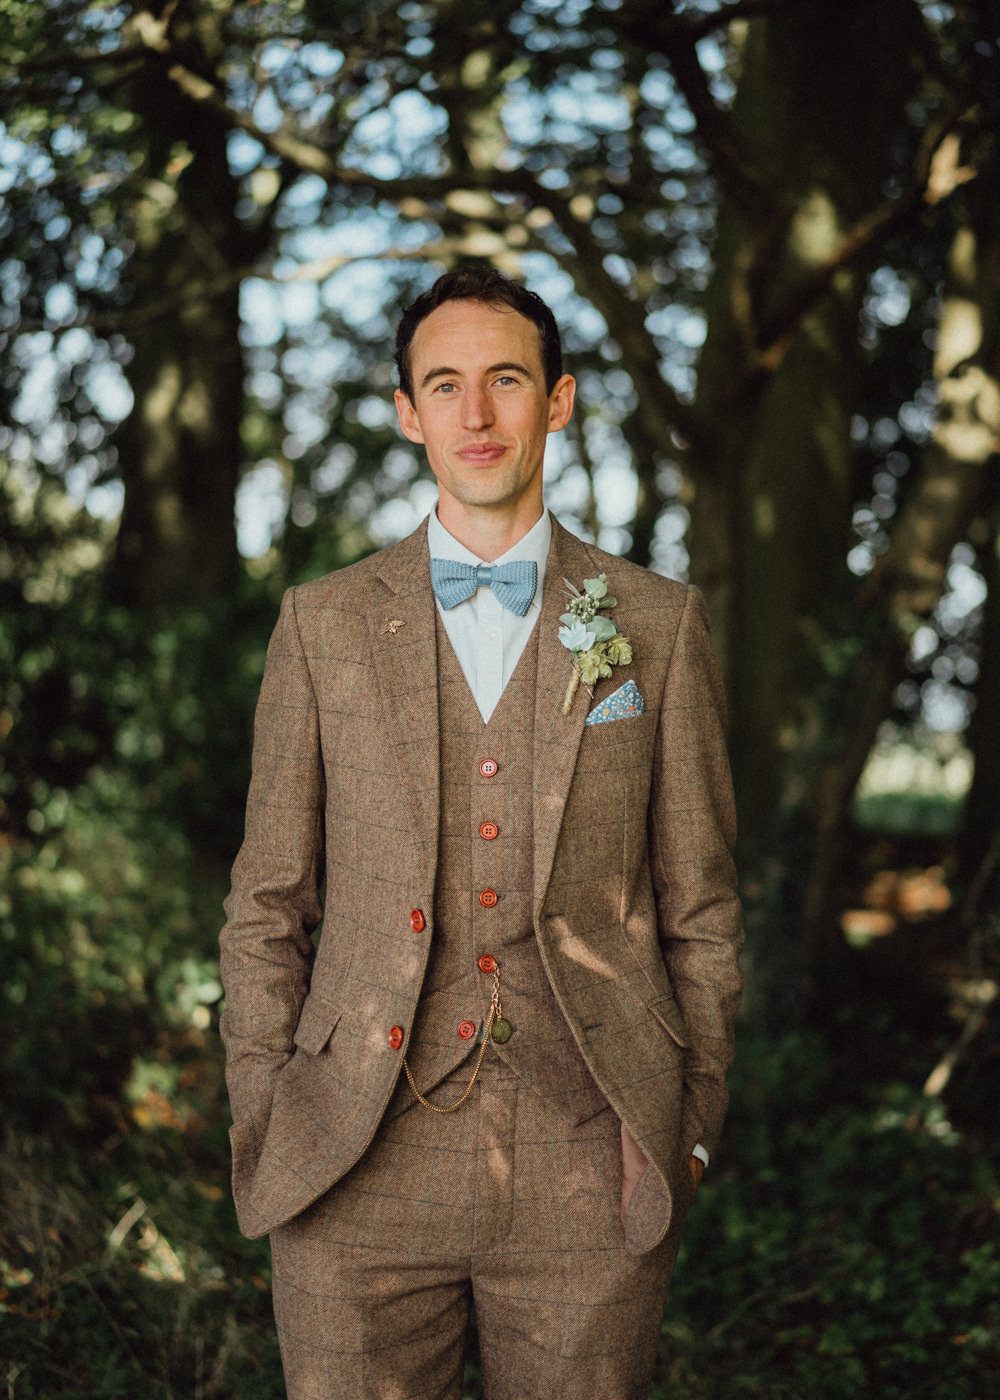 Groom Suit Brown Tweed Bow Tie Pitt Hall Barn Wedding Emily & Steve Photography